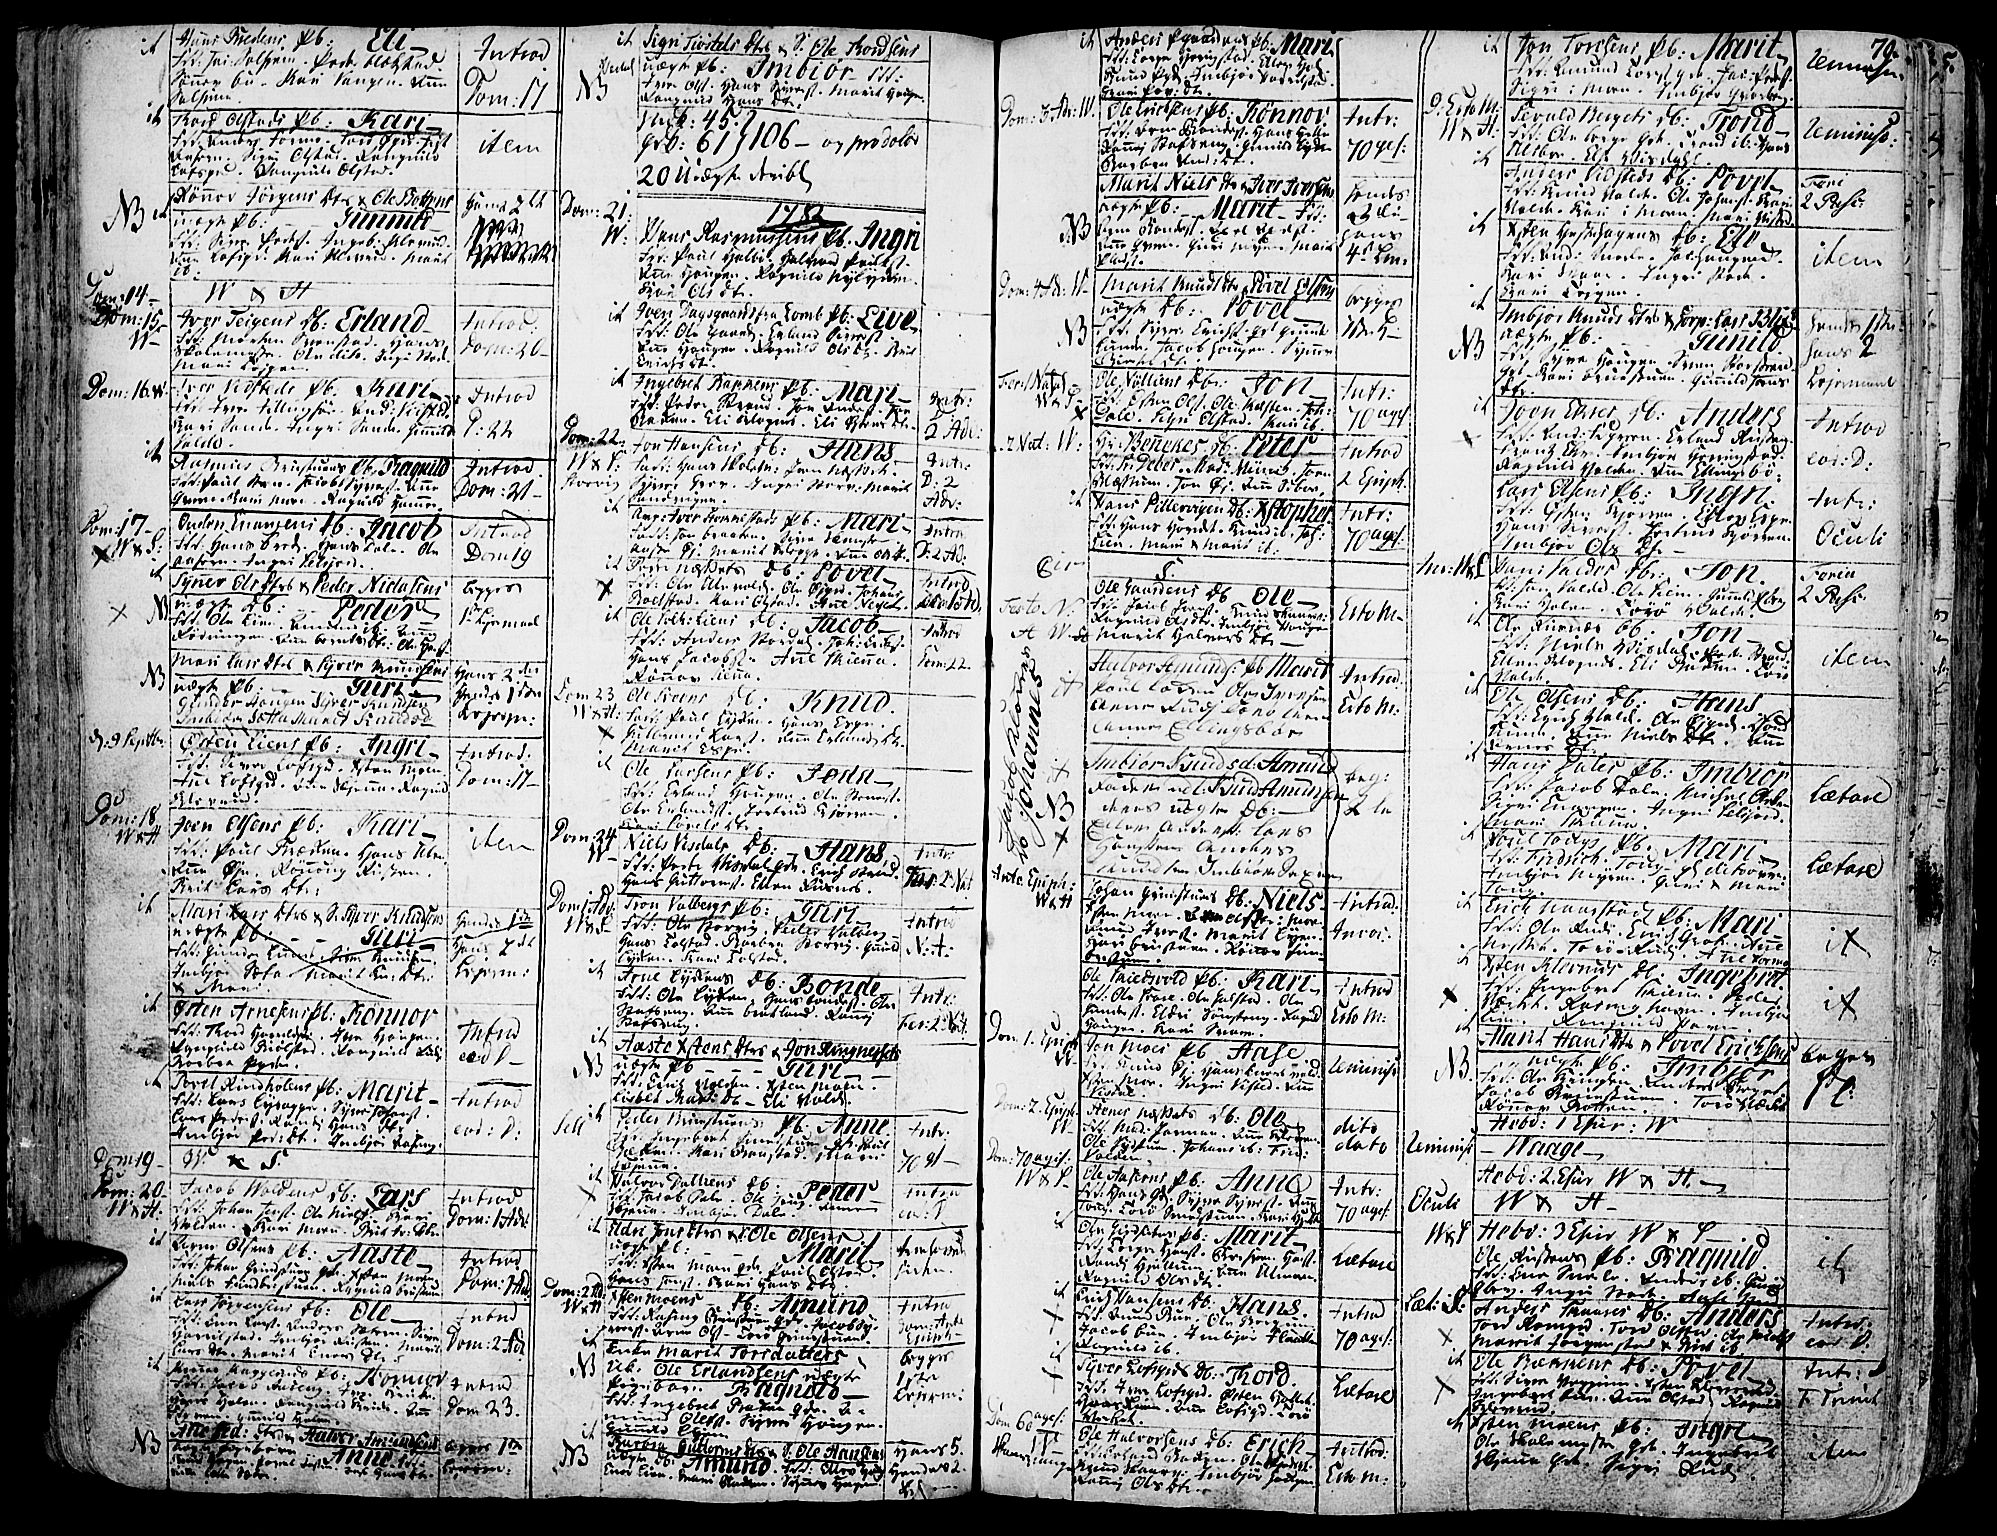 SAH, Vågå prestekontor, Ministerialbok nr. 1, 1739-1810, s. 79